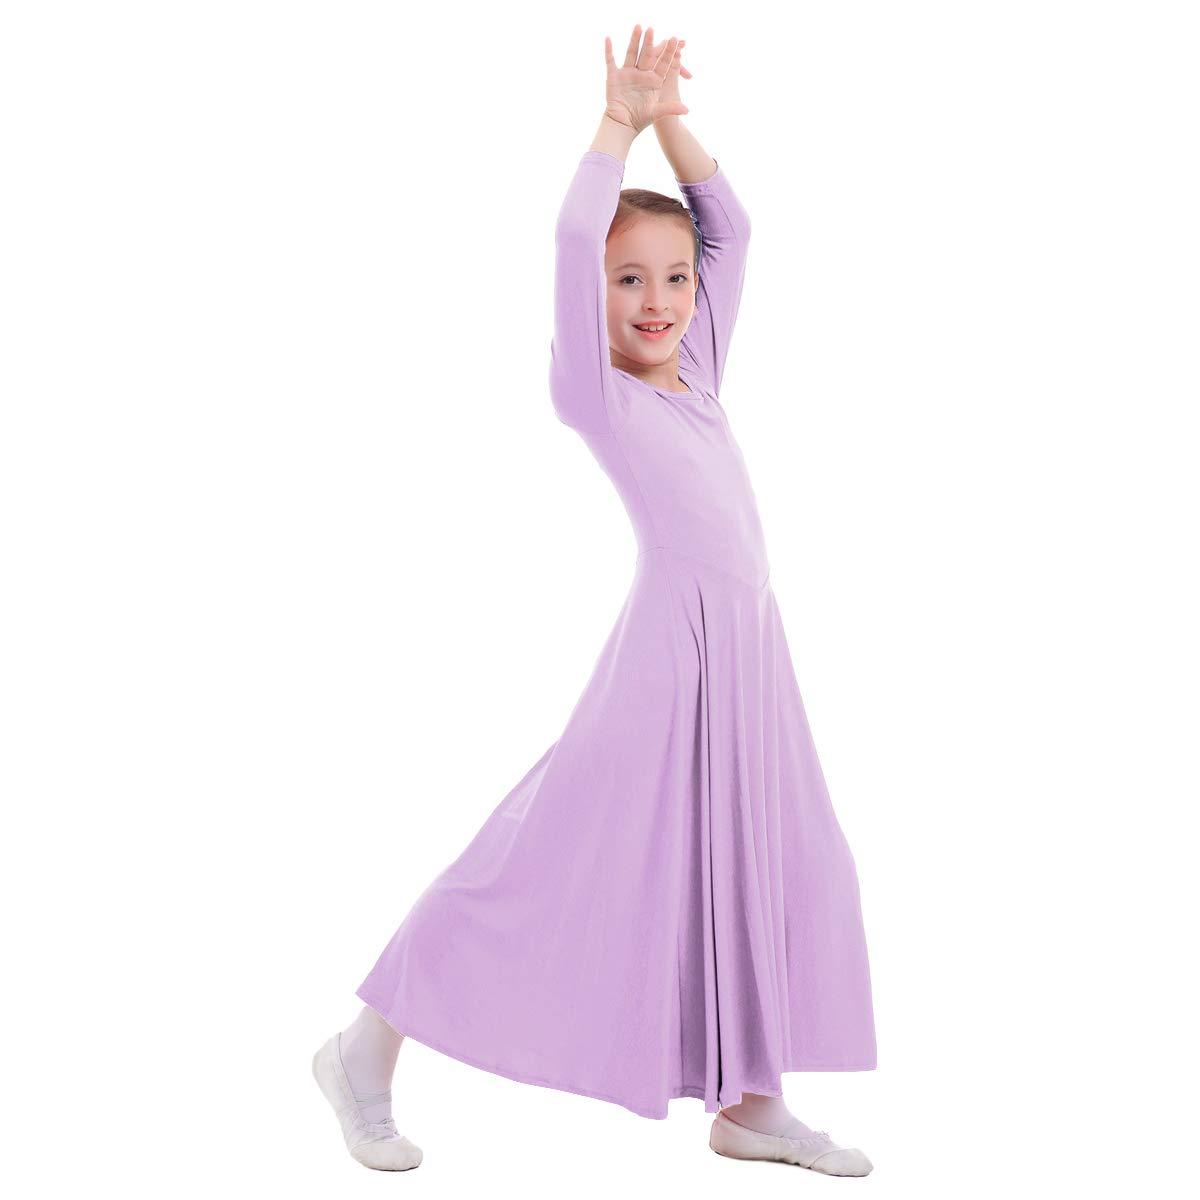 IWEMEK Kids Girls Cotton Long Sleeve Praise Liturgical Loose Fit Full Length Lyrical Dance Dress Ballet Dancewear Costume